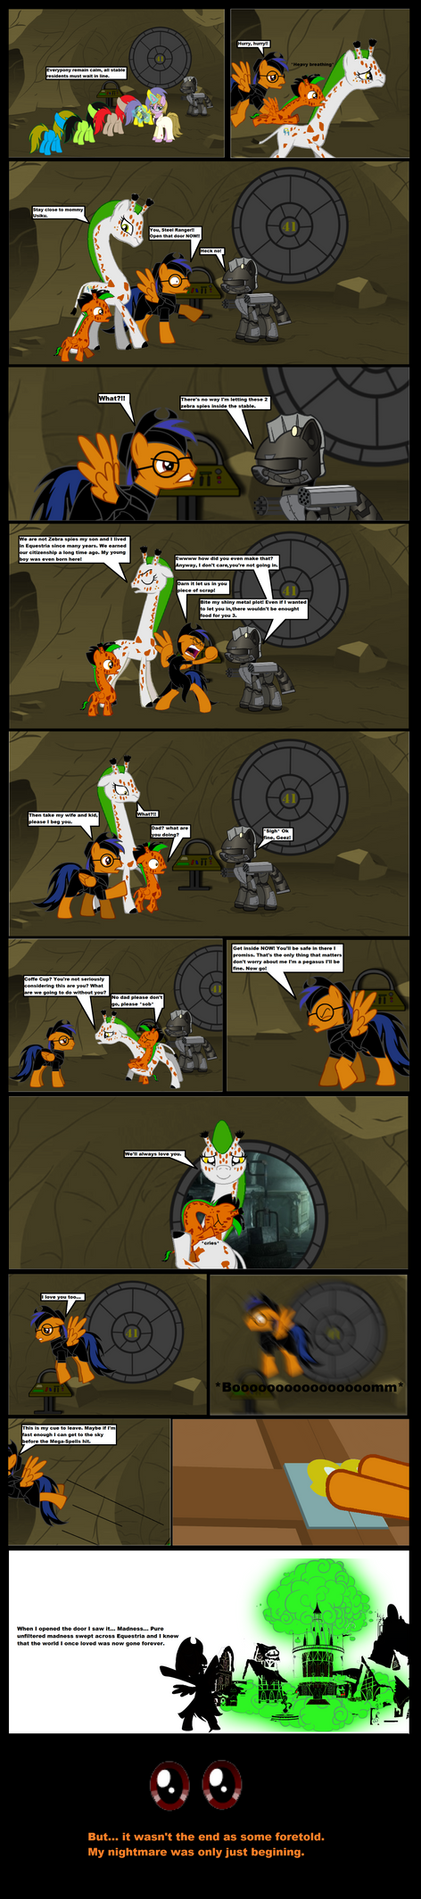 Fallout Equestria Curse of the Goulish Pegasus 2 by darkoak213